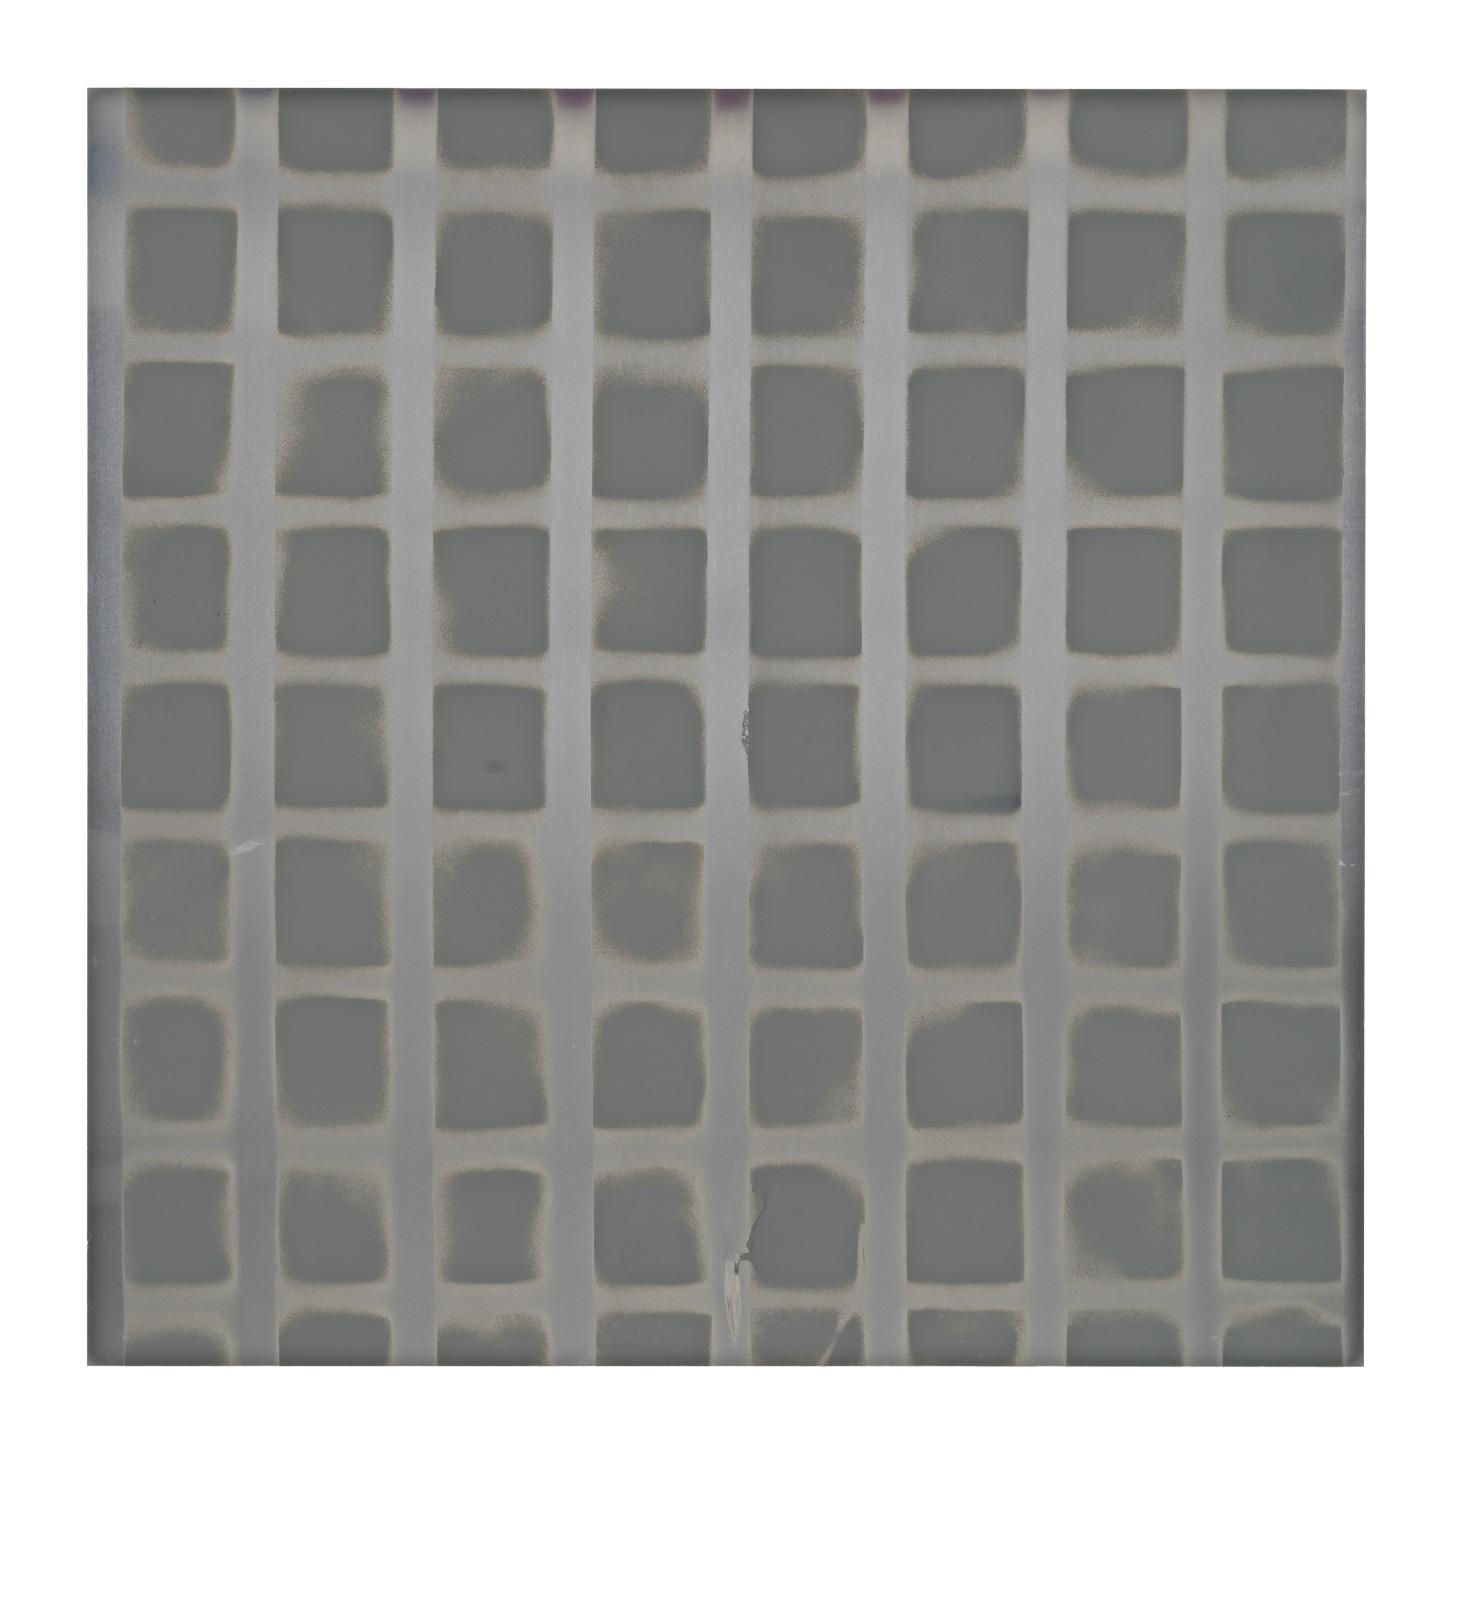 "STAIN : 55°46'47.5""N 13°05'39.0""E, 2016, spraypaint on aluminium, 81,3 x 81,3 cm"